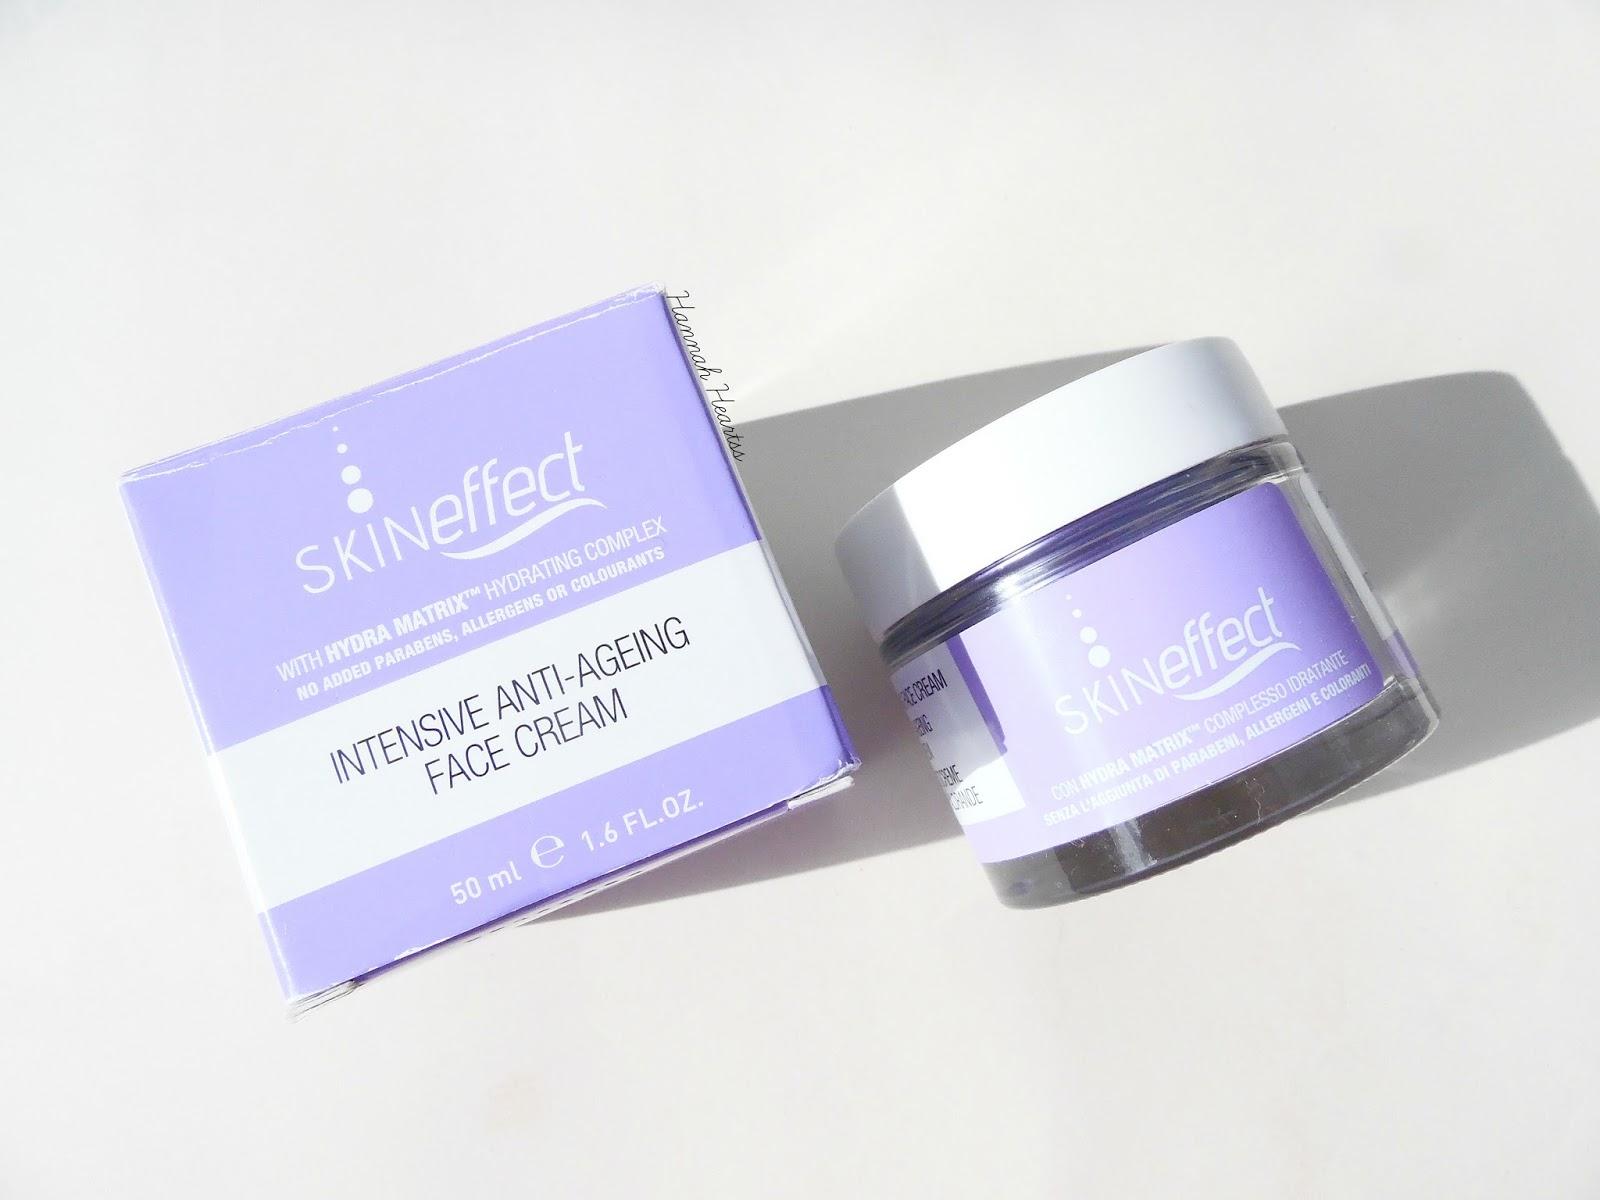 SKINeffect Intensive Anti-Ageing Face Cream